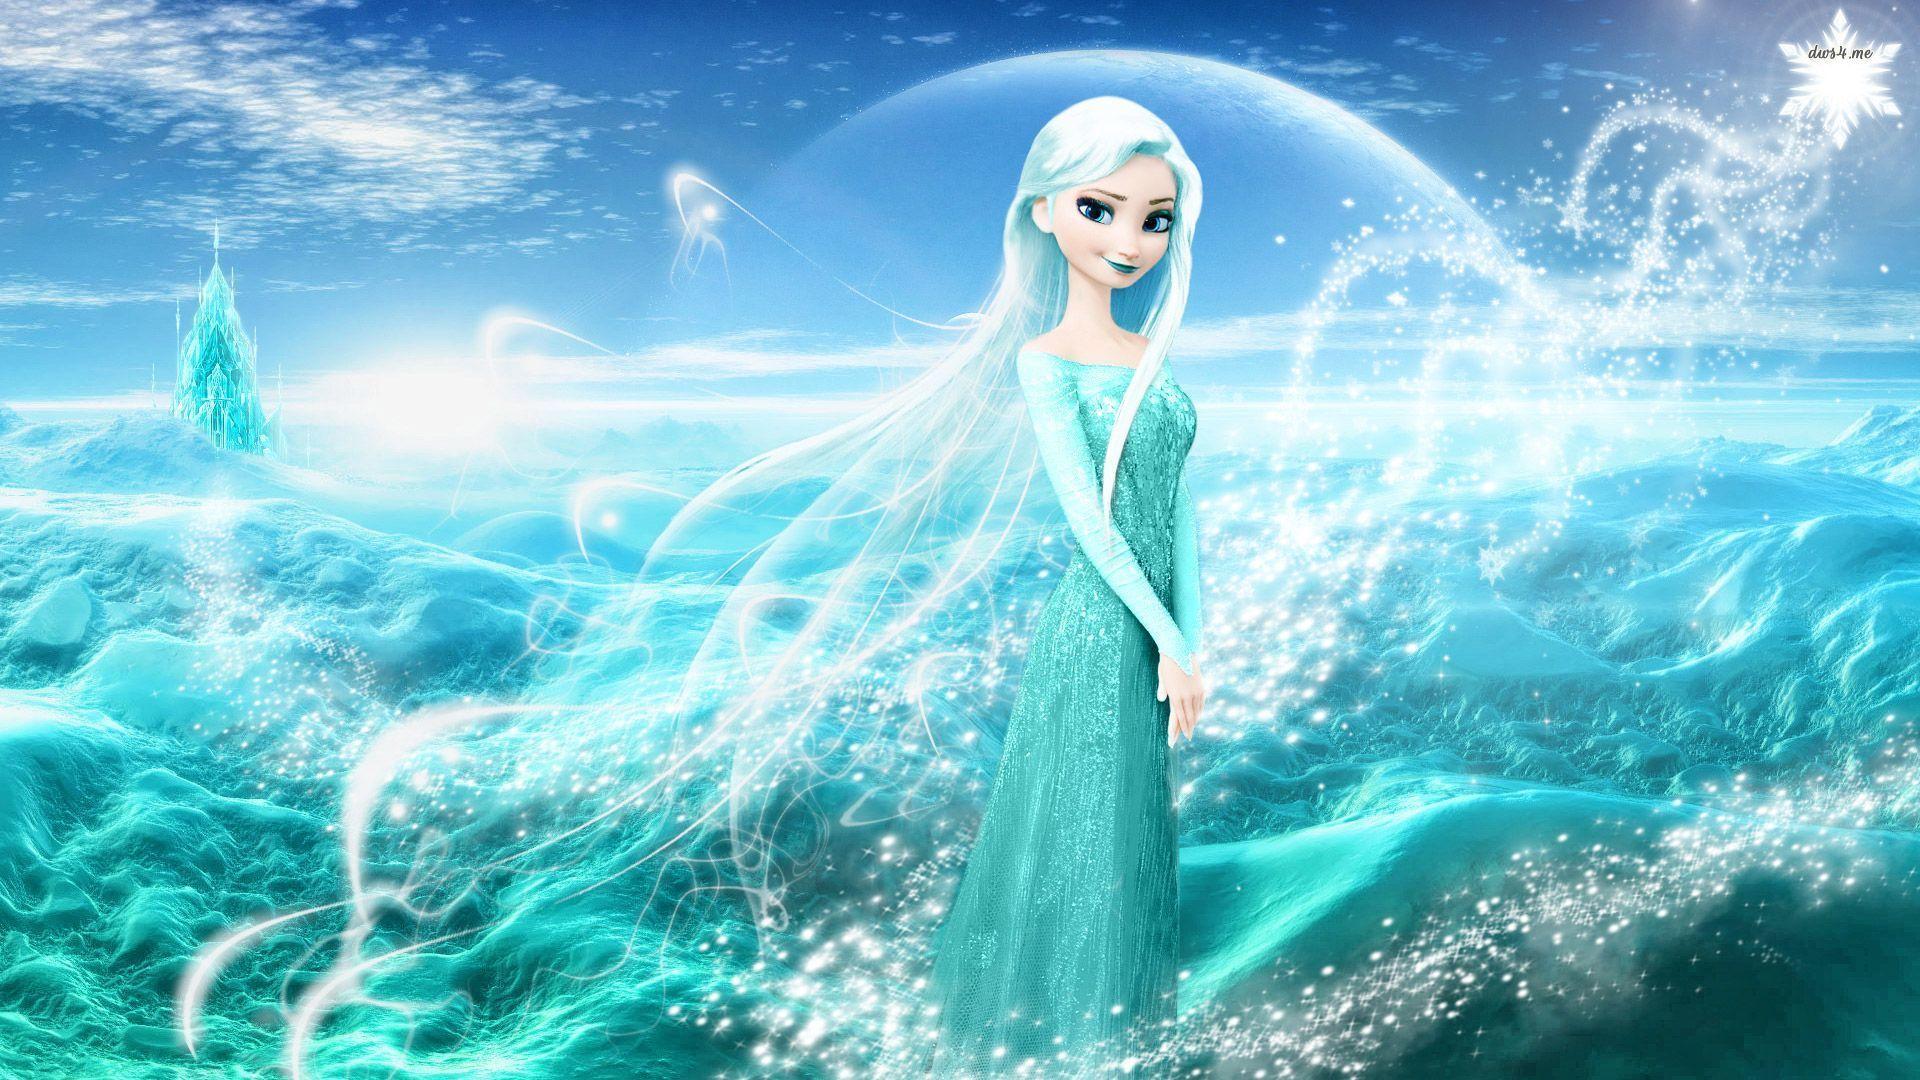 Frozen Wallpaper 526 Good Best